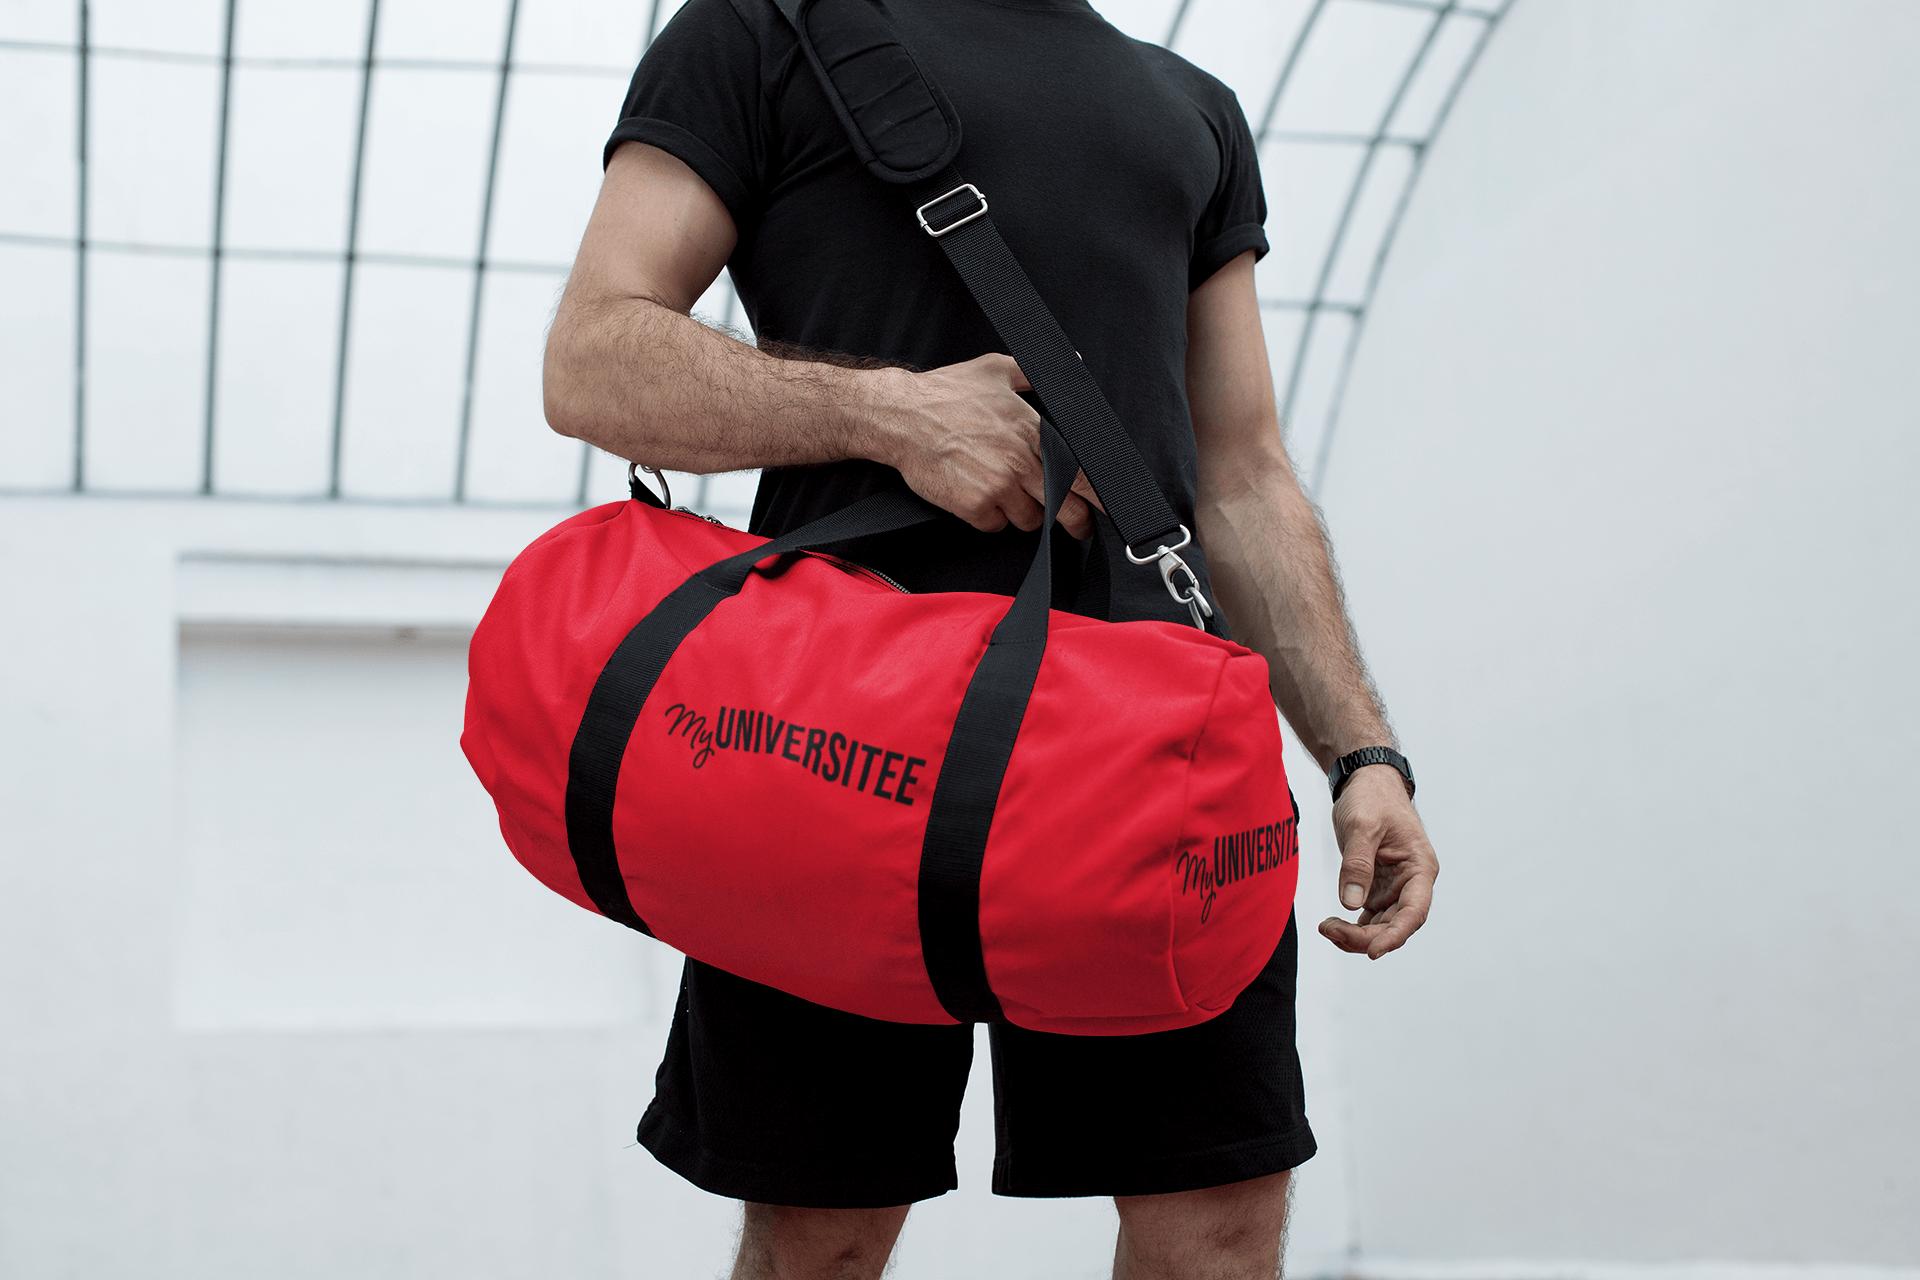 mockup-of-a-kit-bag-carried-around-a-man-s-shoulder-23062